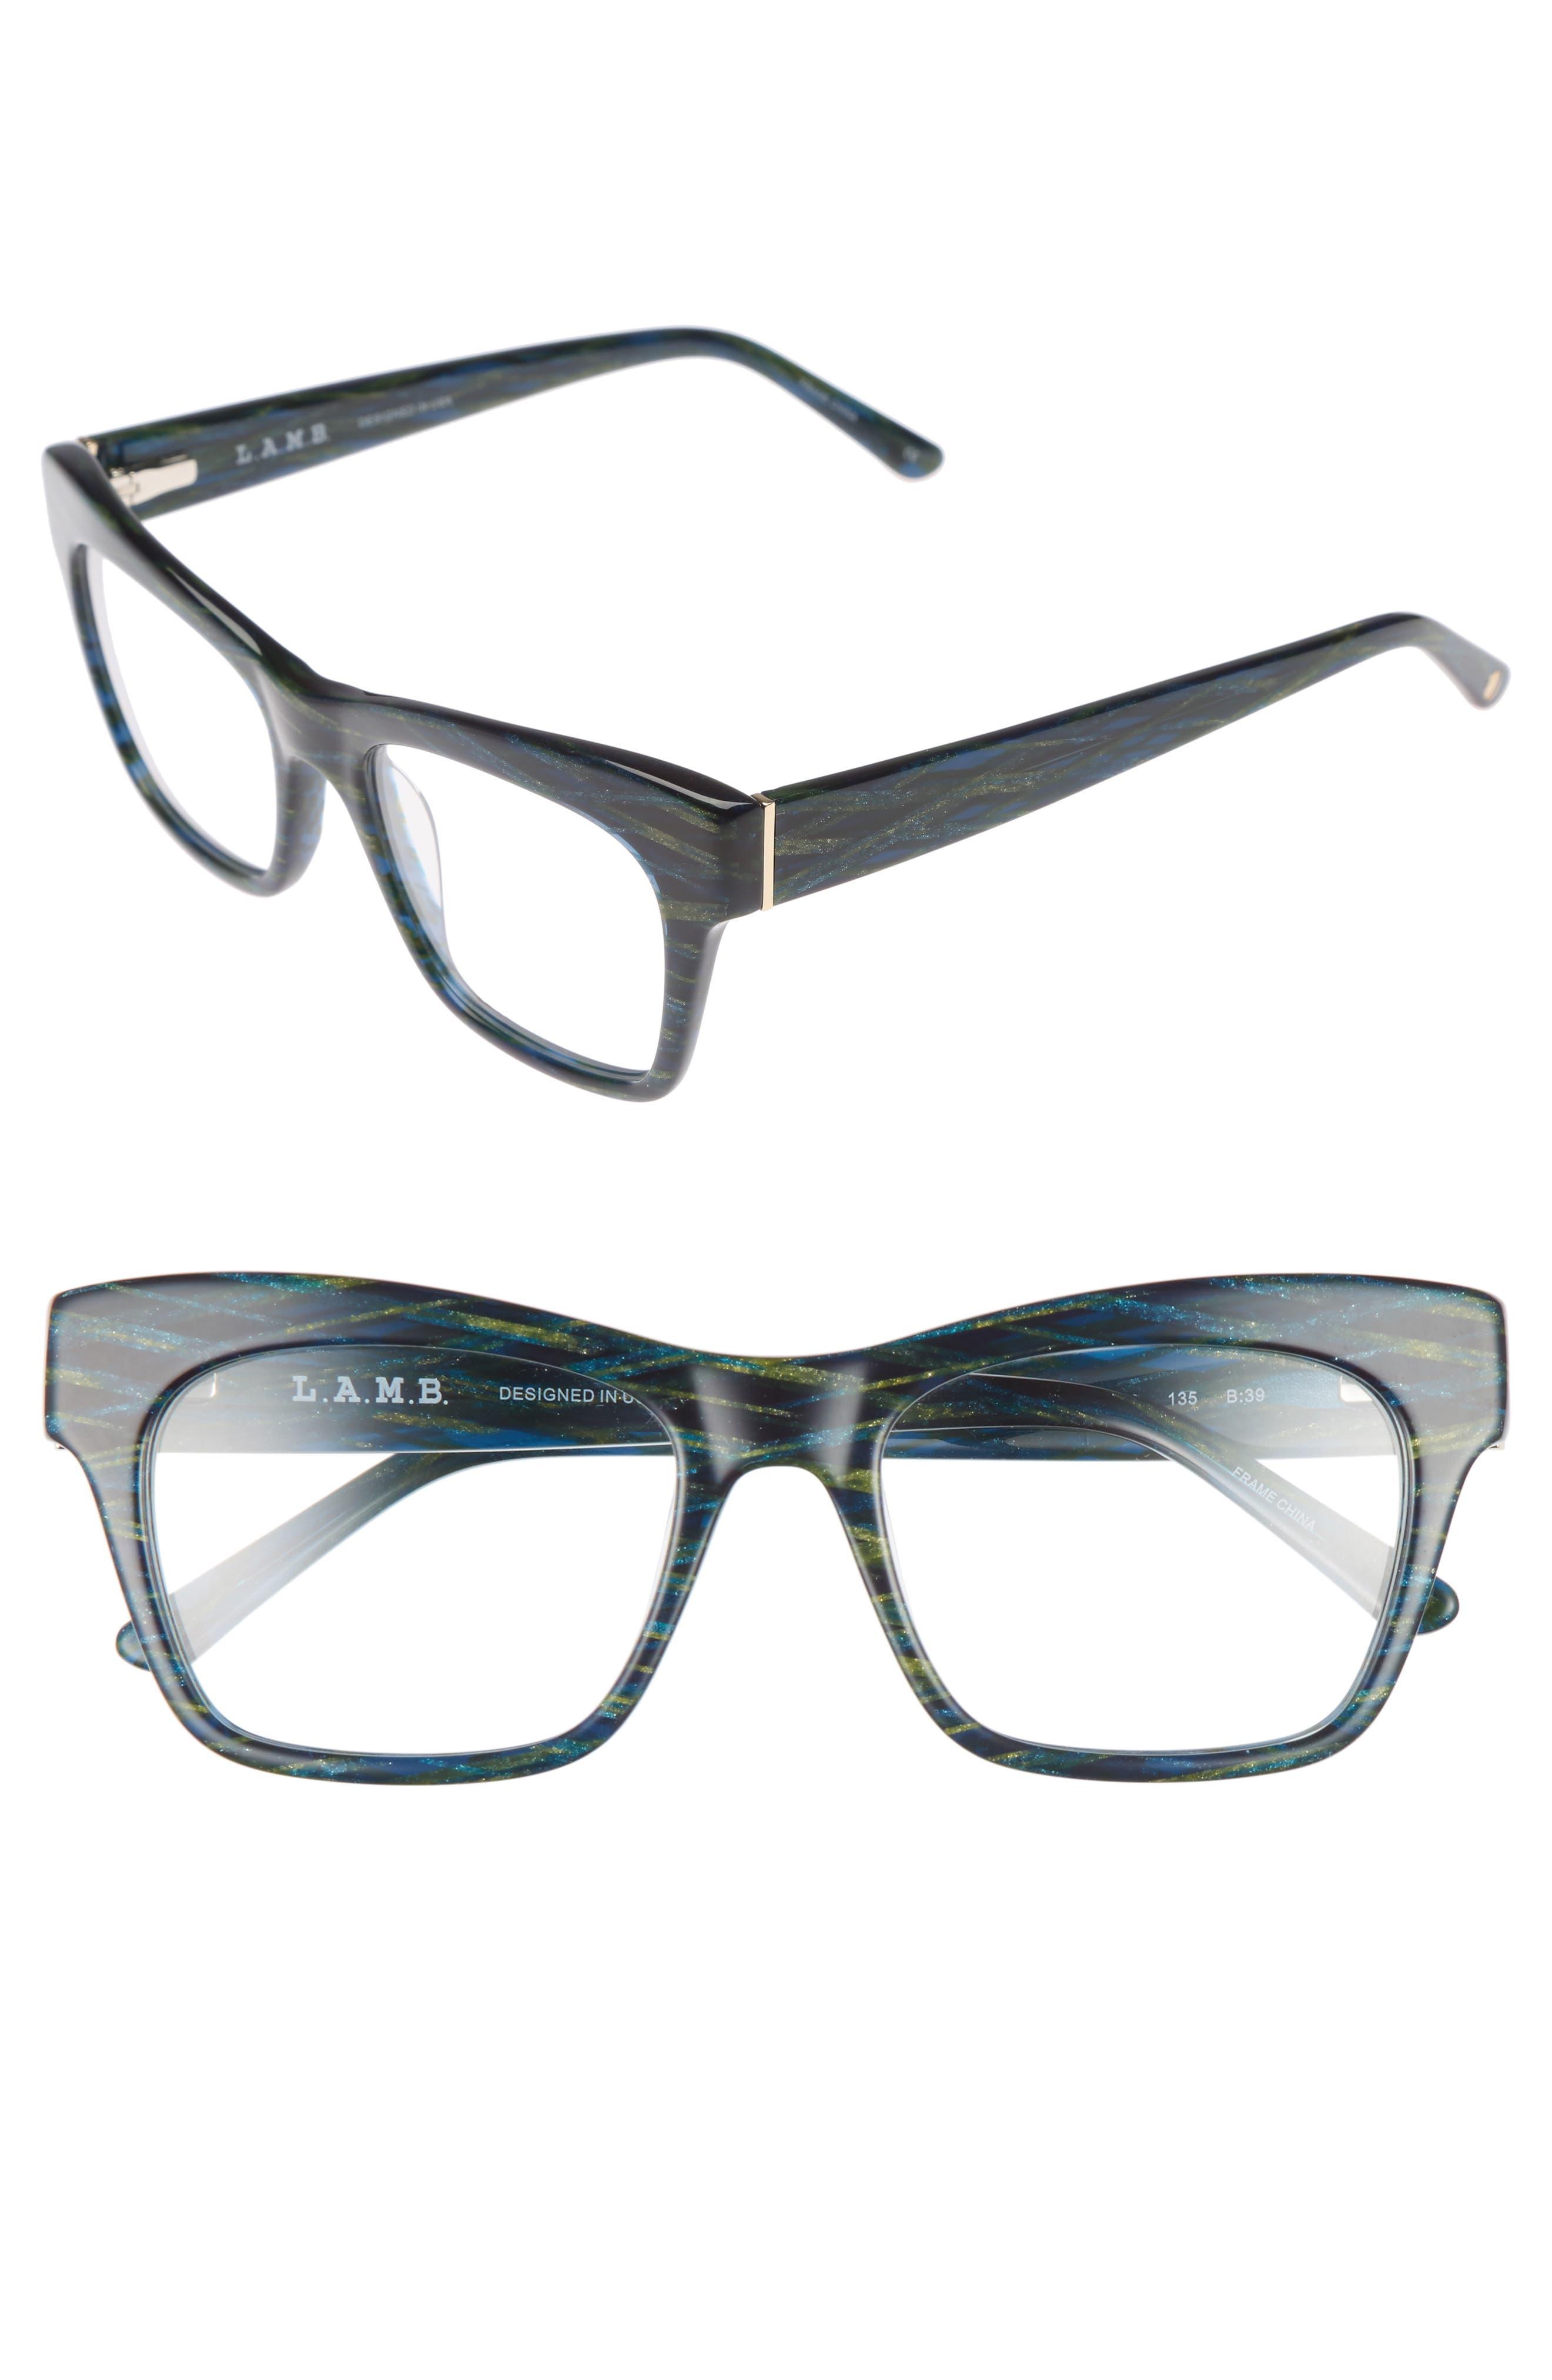 50mm Optical Rectangular Glasses,                             Main thumbnail 1, color,                             400